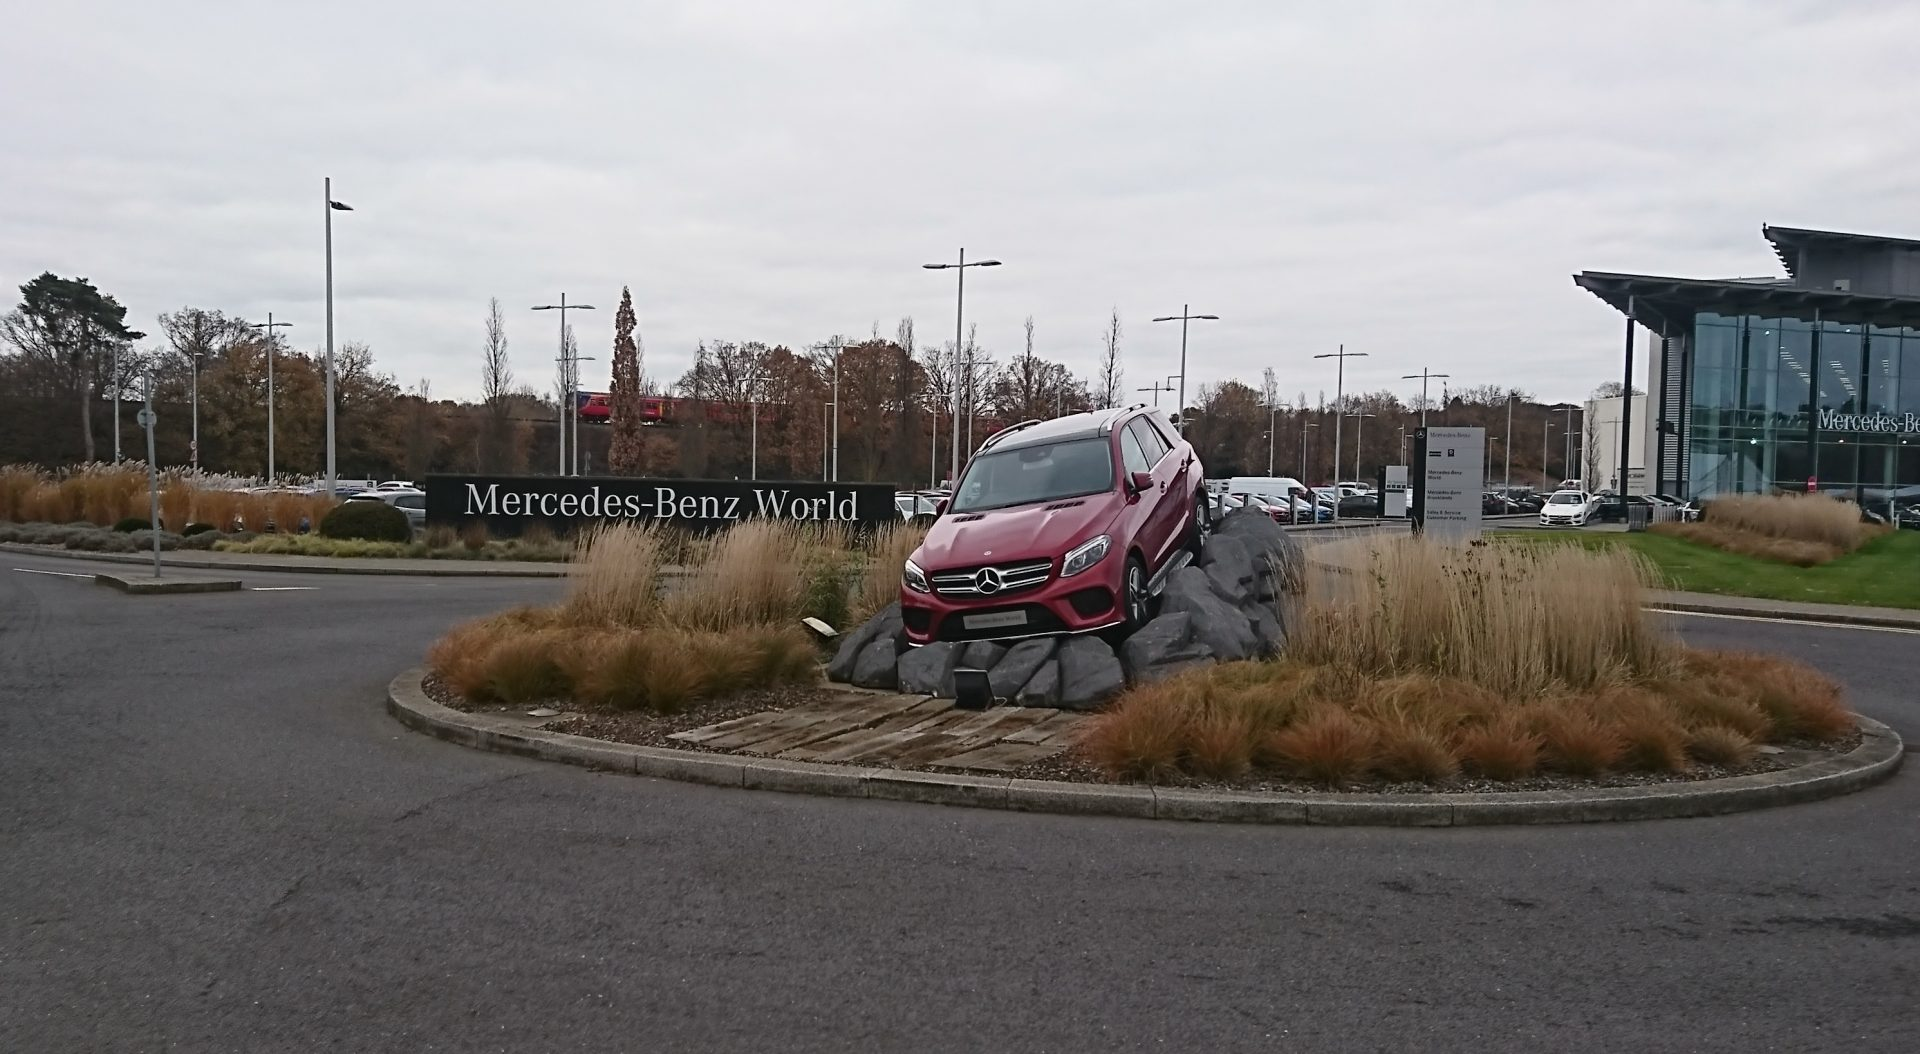 MBenz-World-1920x1054